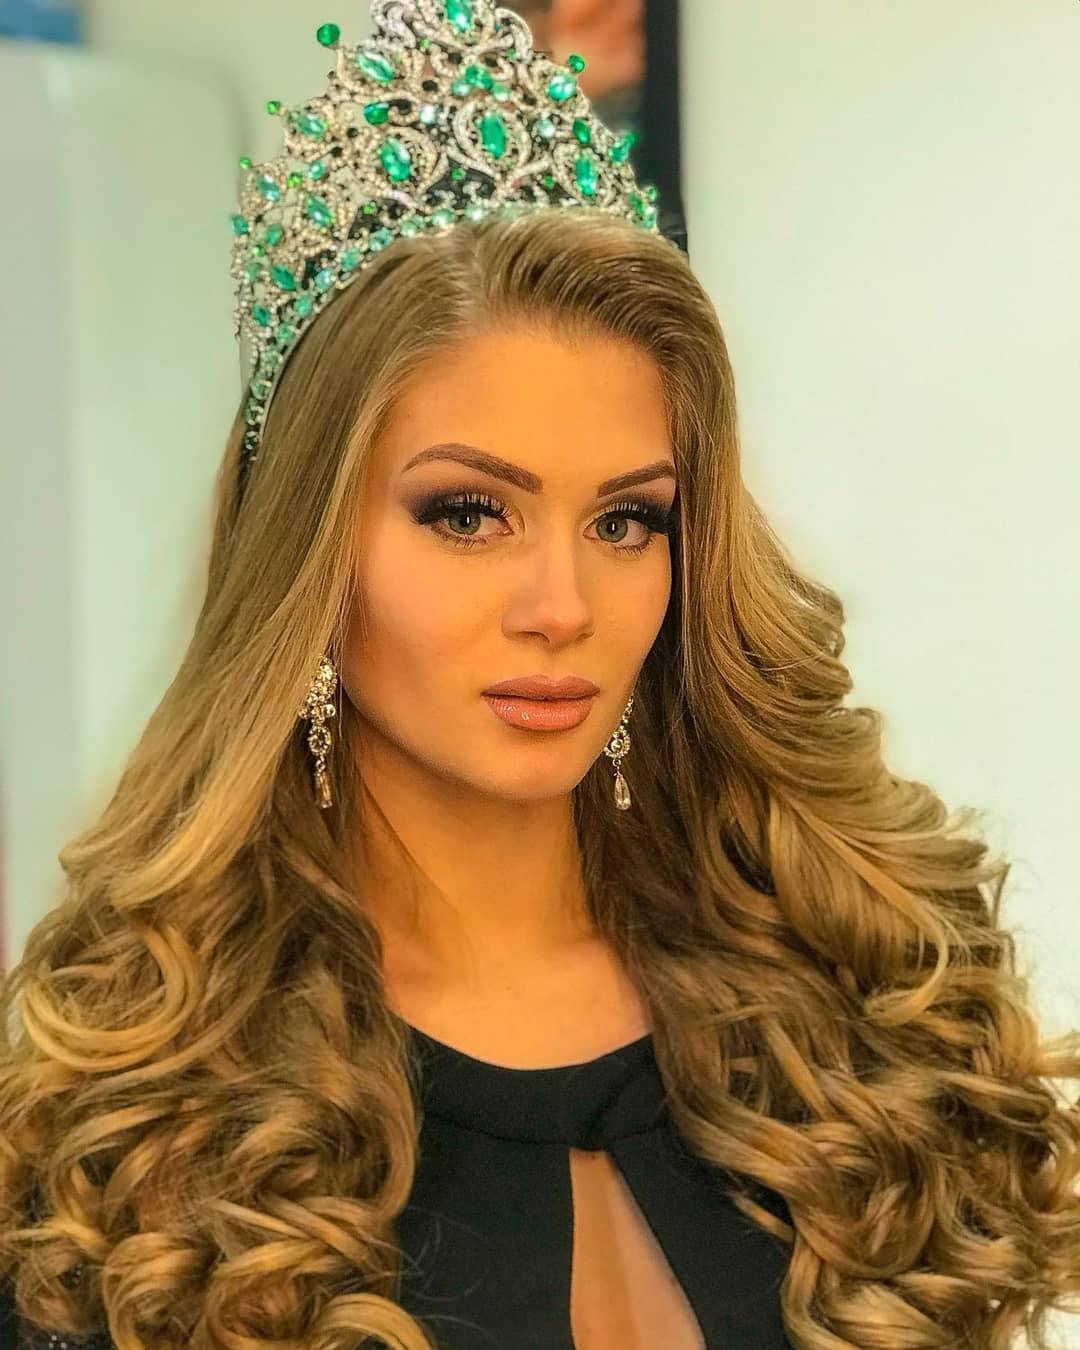 gabriela palma, miss brasil empresarial 2018. - Página 6 39025510